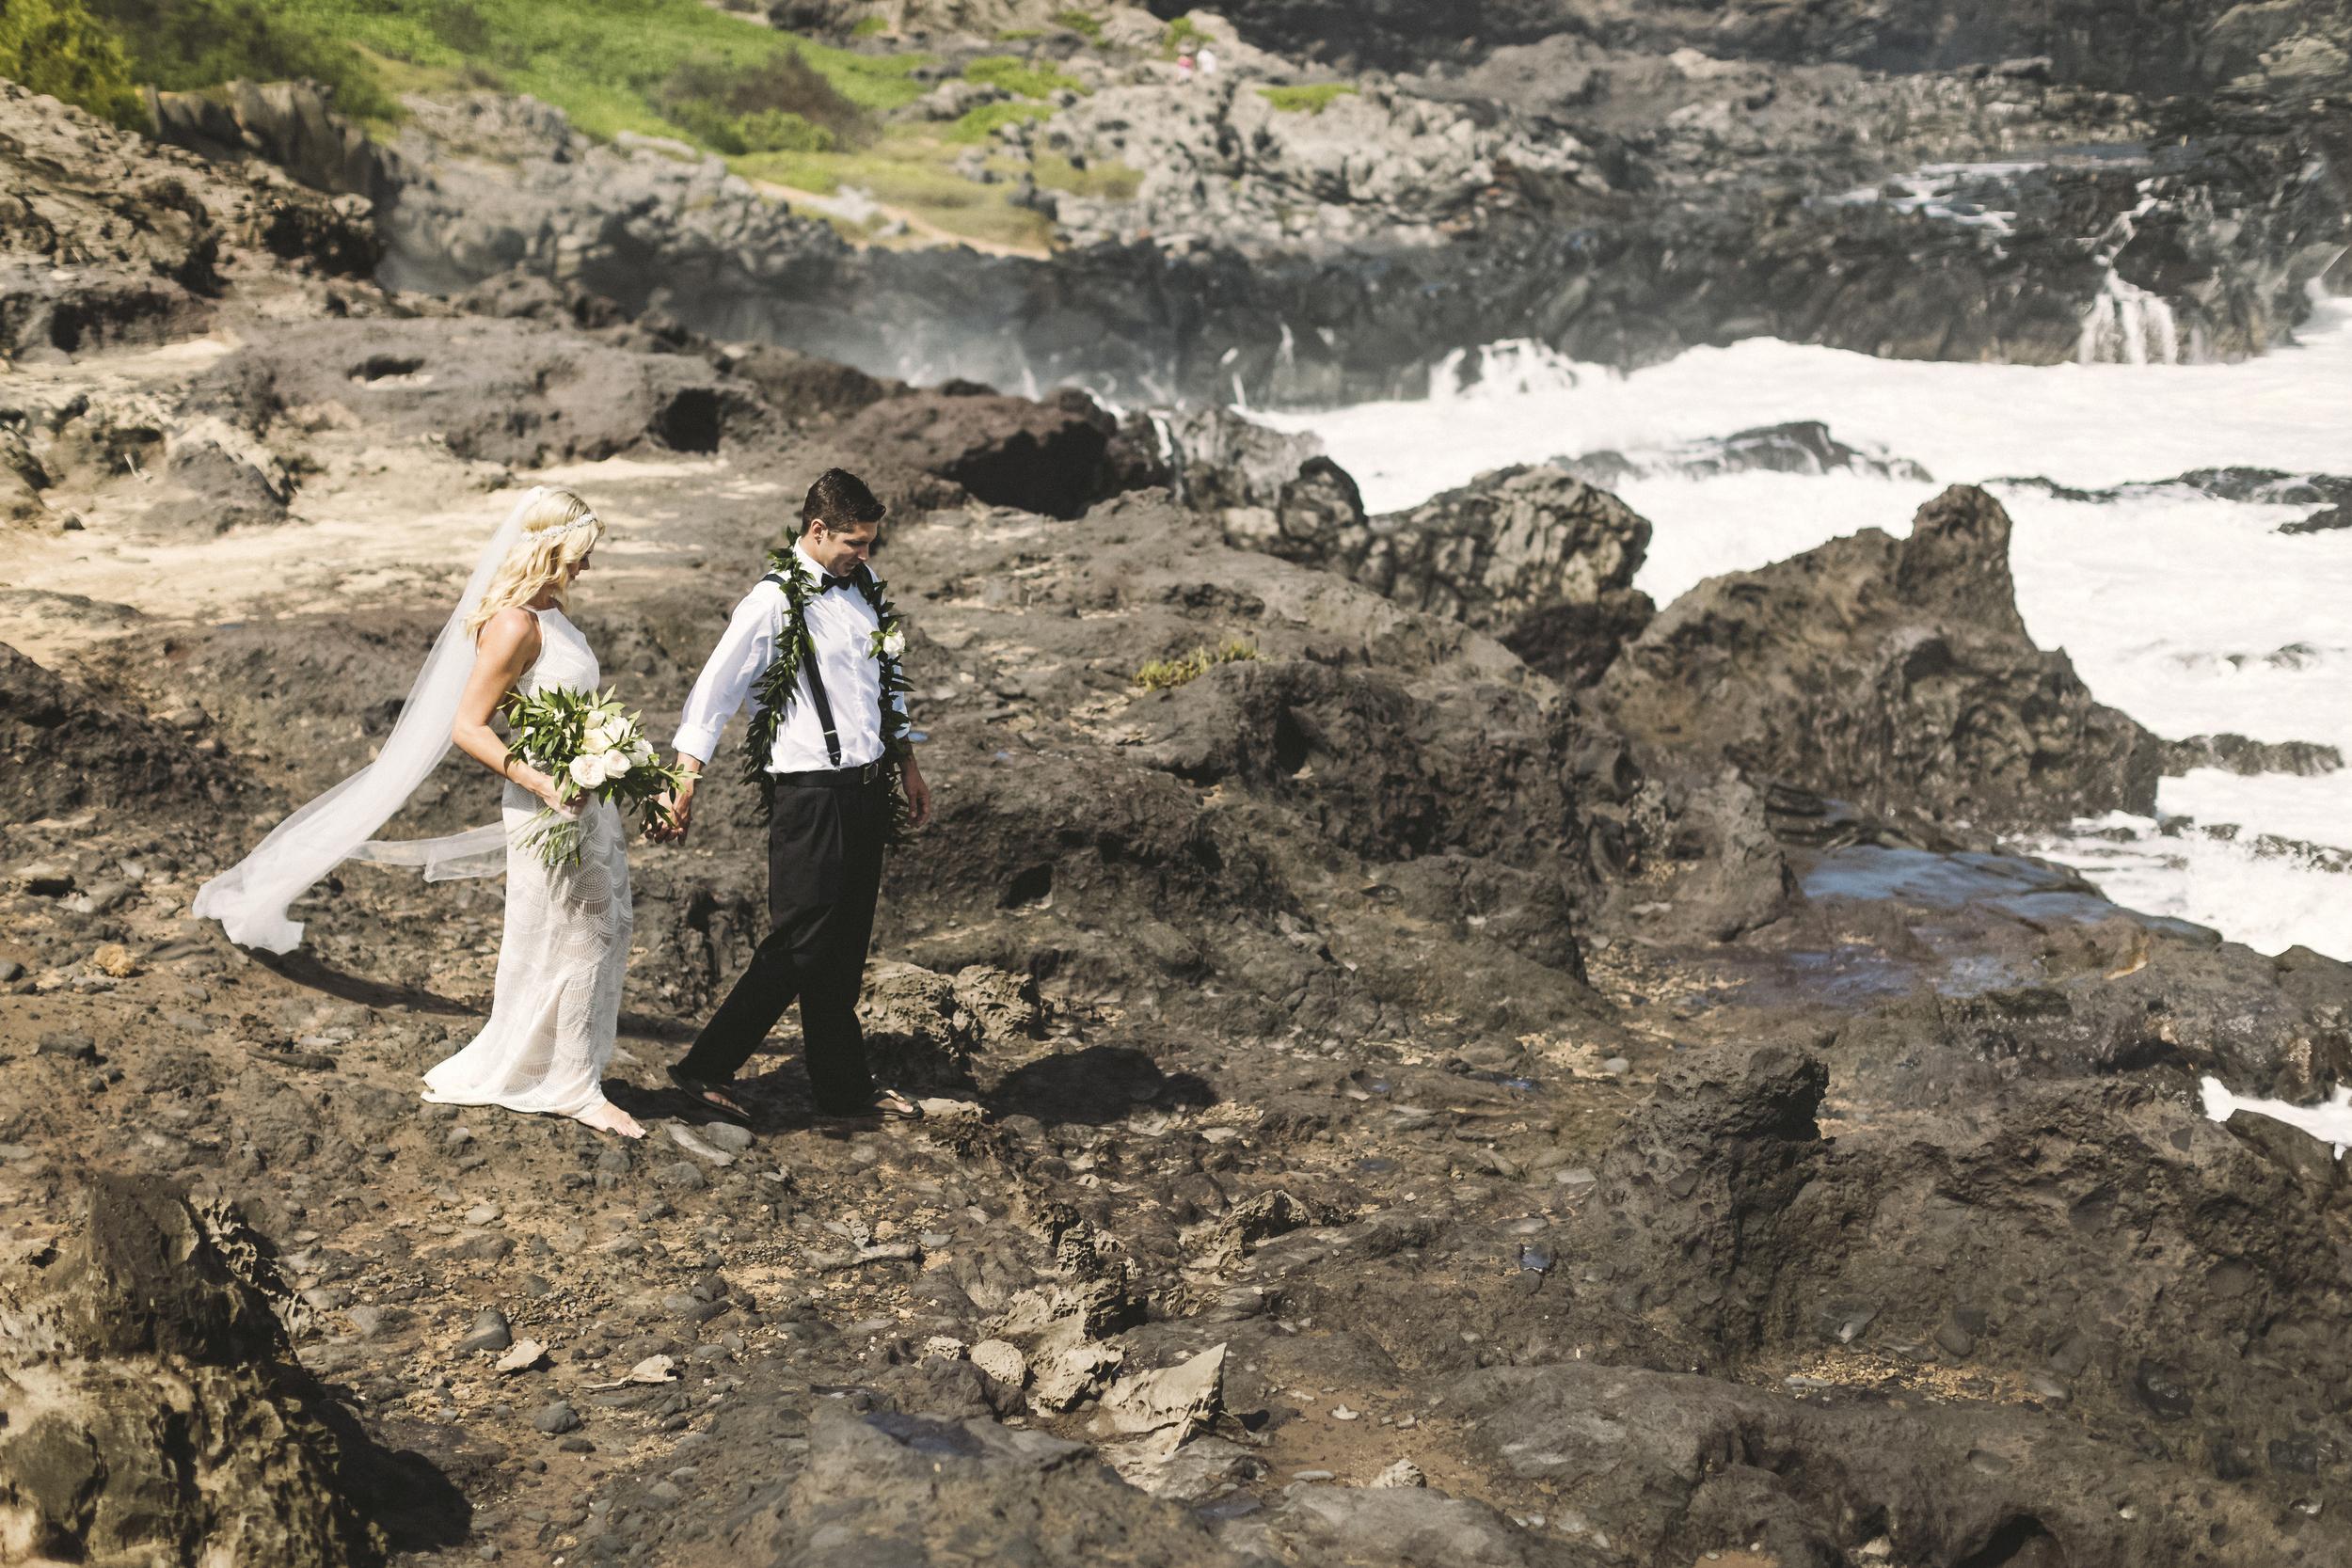 angie-diaz-photography-hawaii-wedding-39.jpg